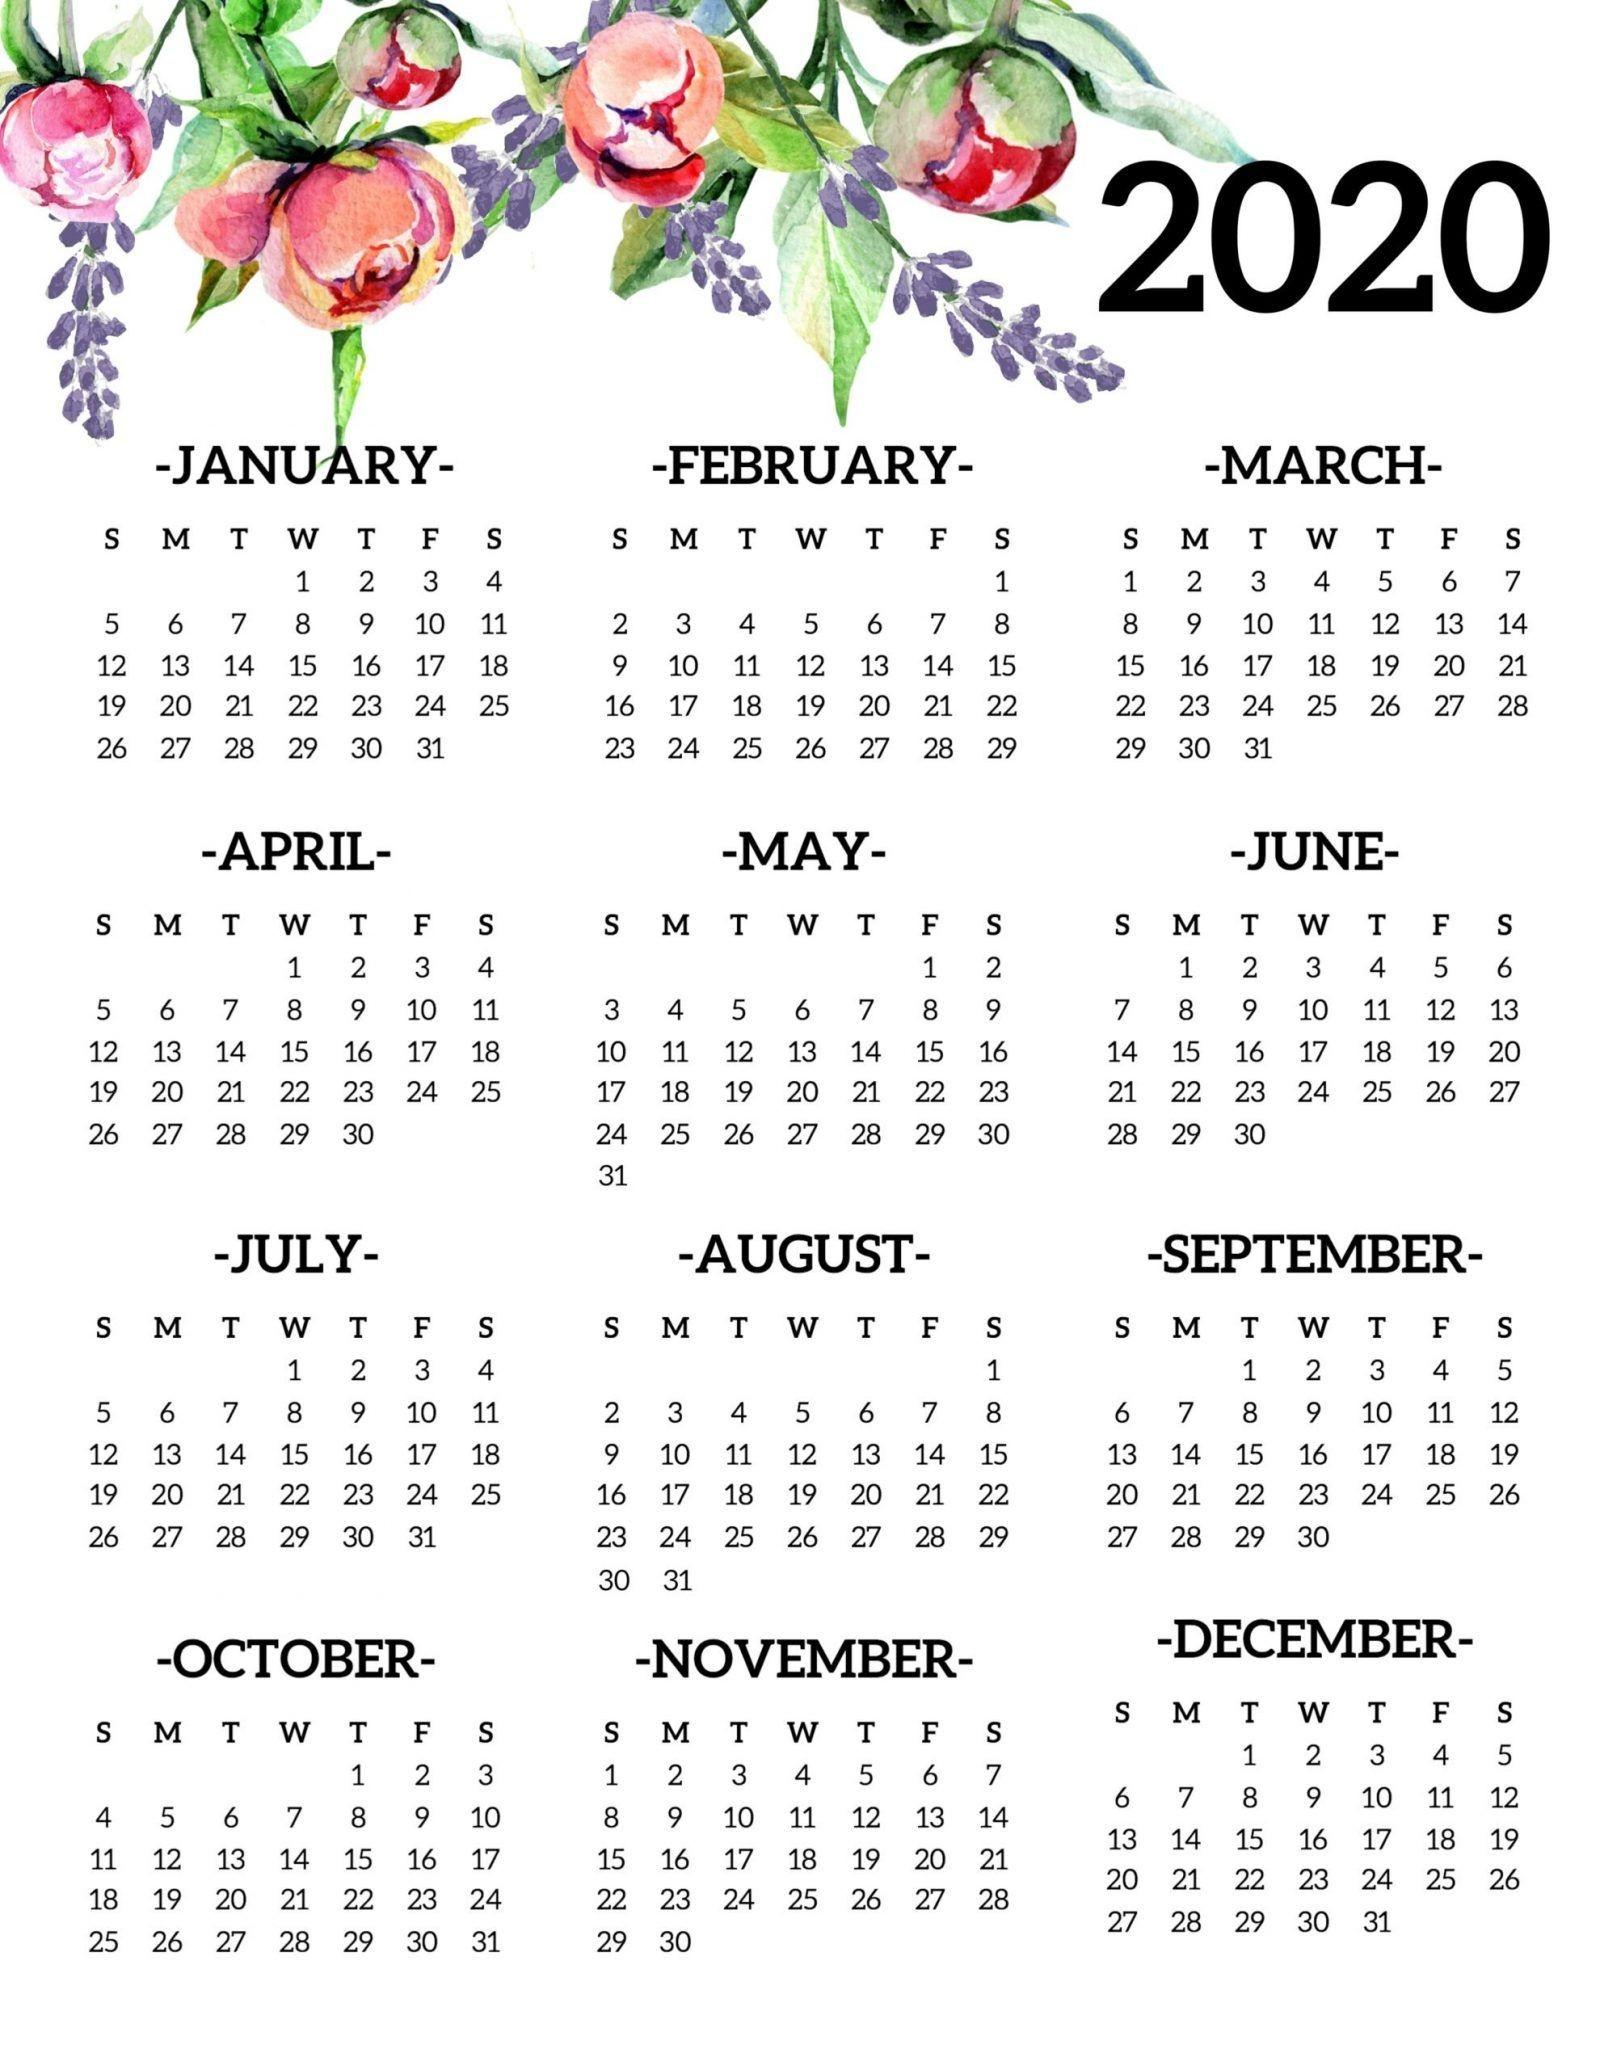 20 Free Printable Calendars - Yearly 2020 Calendar In 2020-School Year Calendar 2020-20 Template